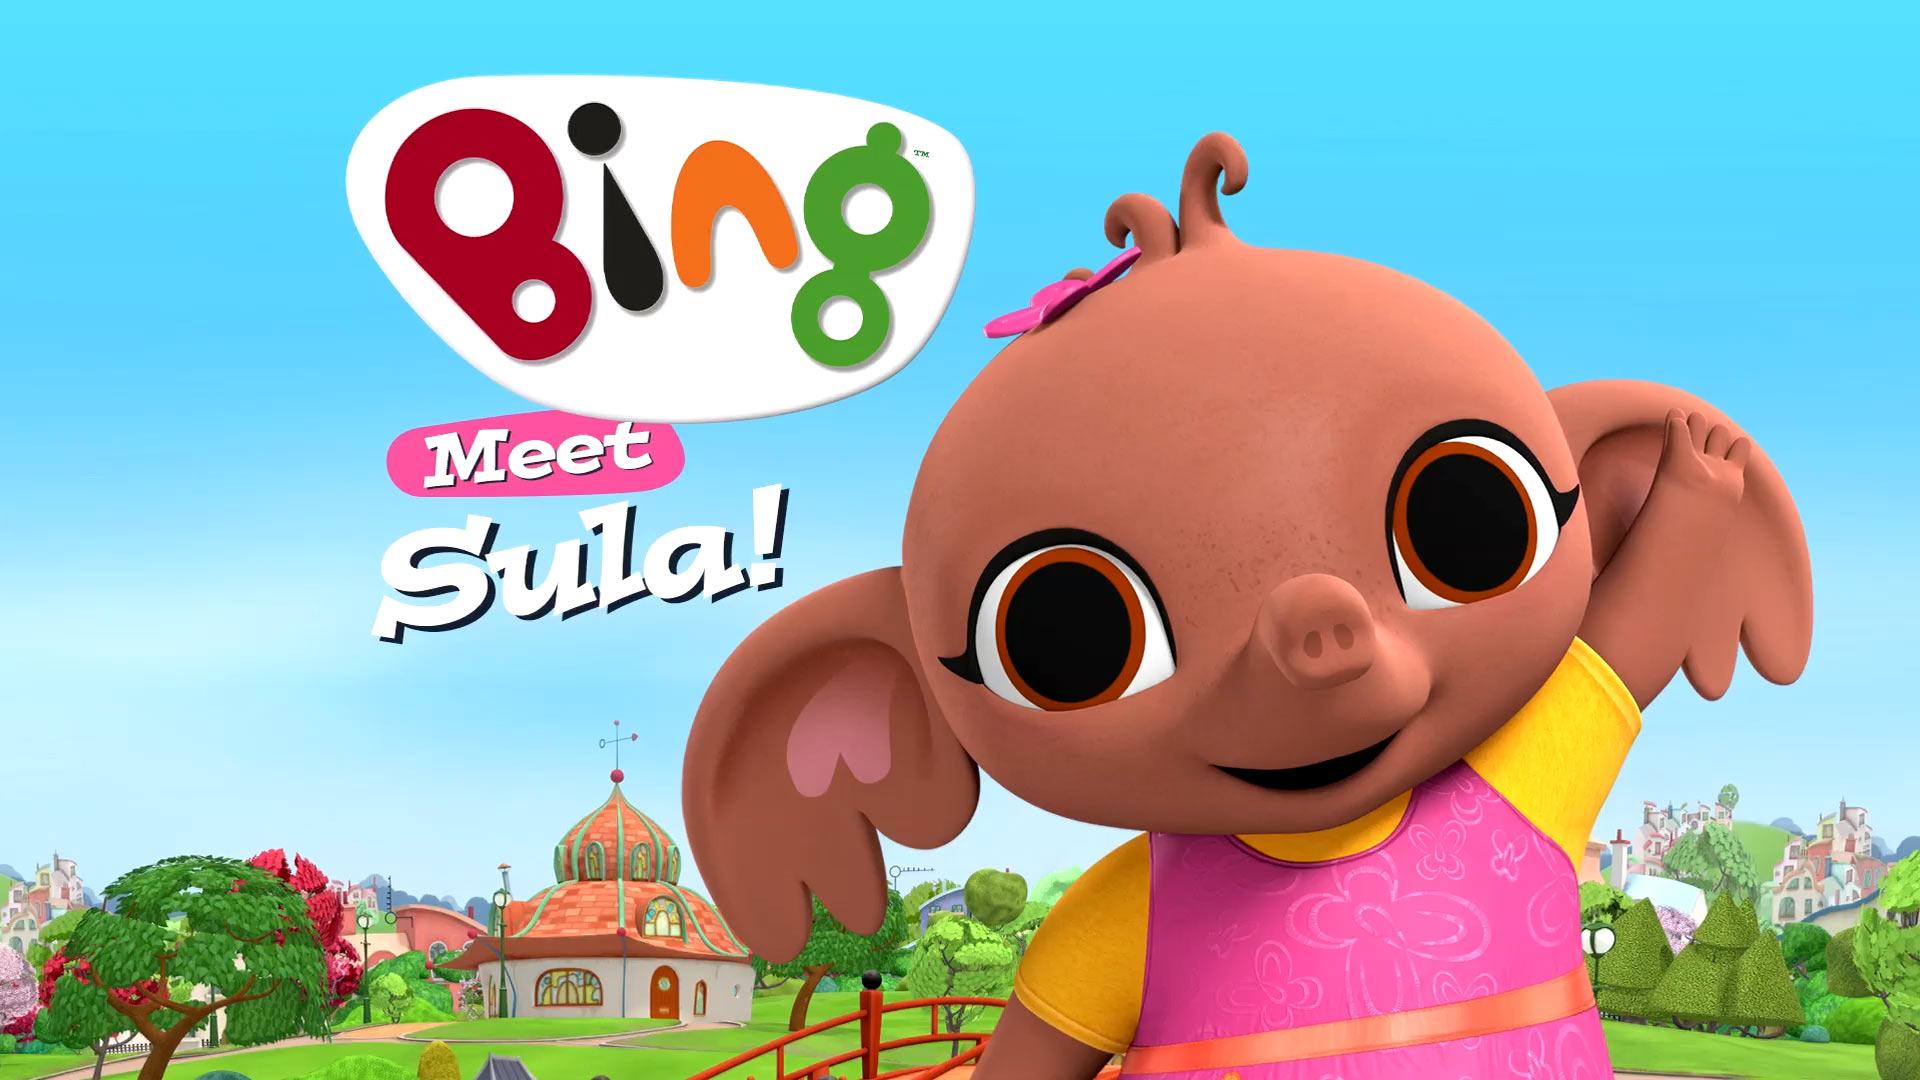 Bing clipart zula. Meet sula bunny